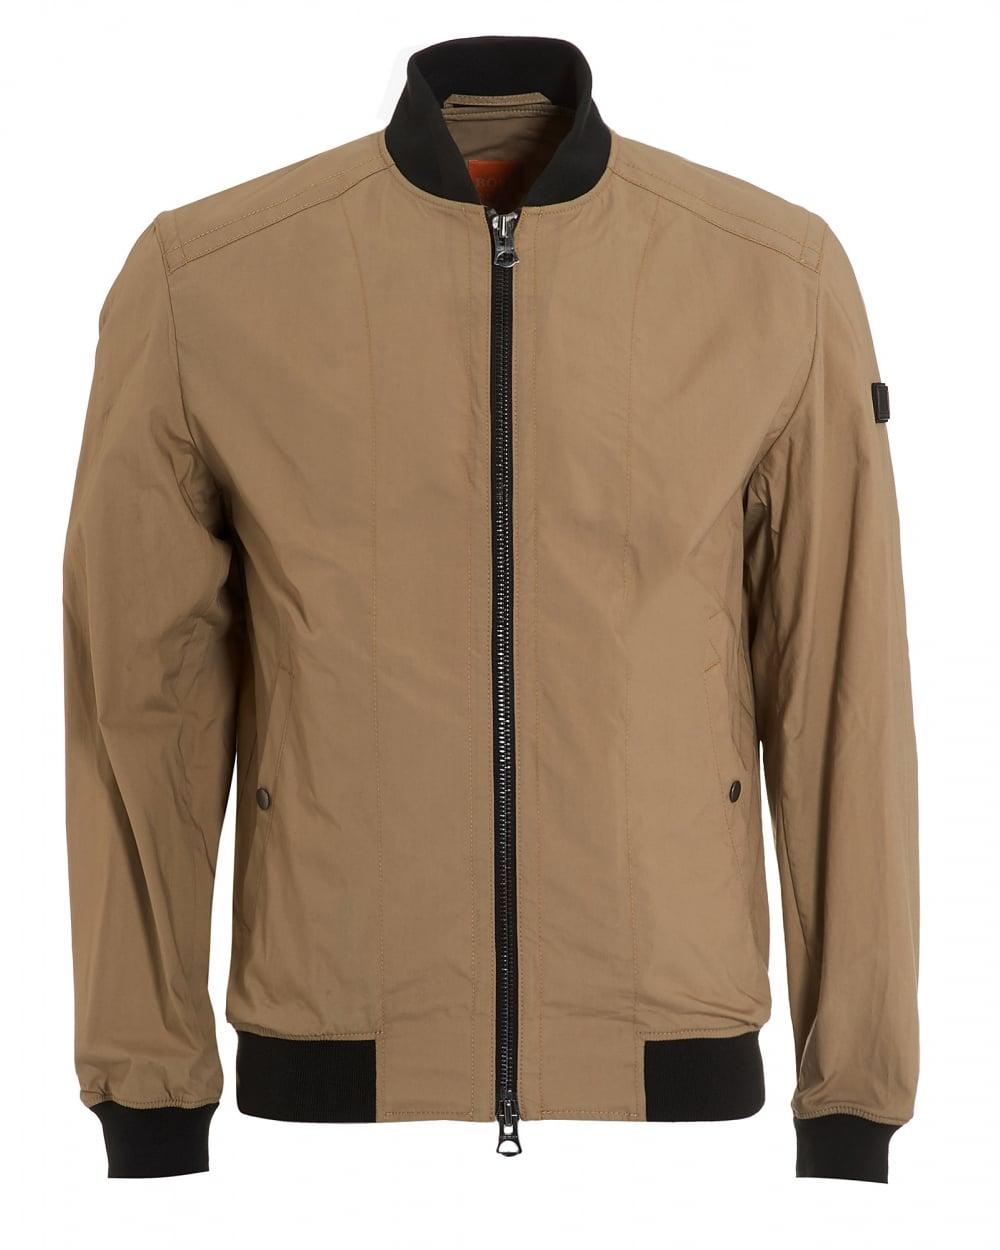 ec3e5cca8 Hugo Boss Orange Mens Oruce Bomber, Contrast Collar Beige Jacket